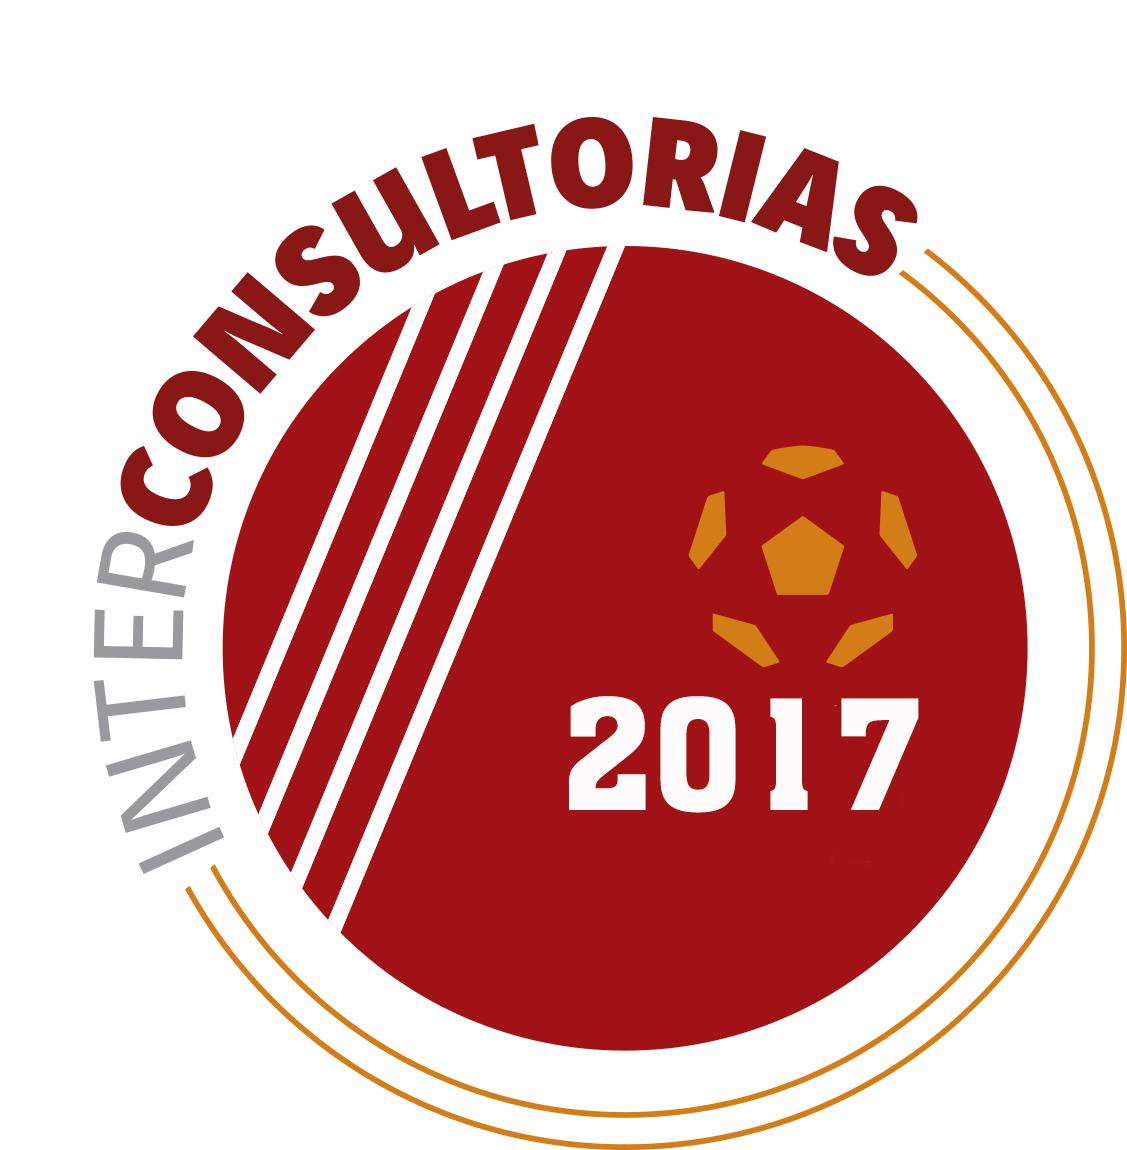 Copa INTERCONSULTORIAS 2017